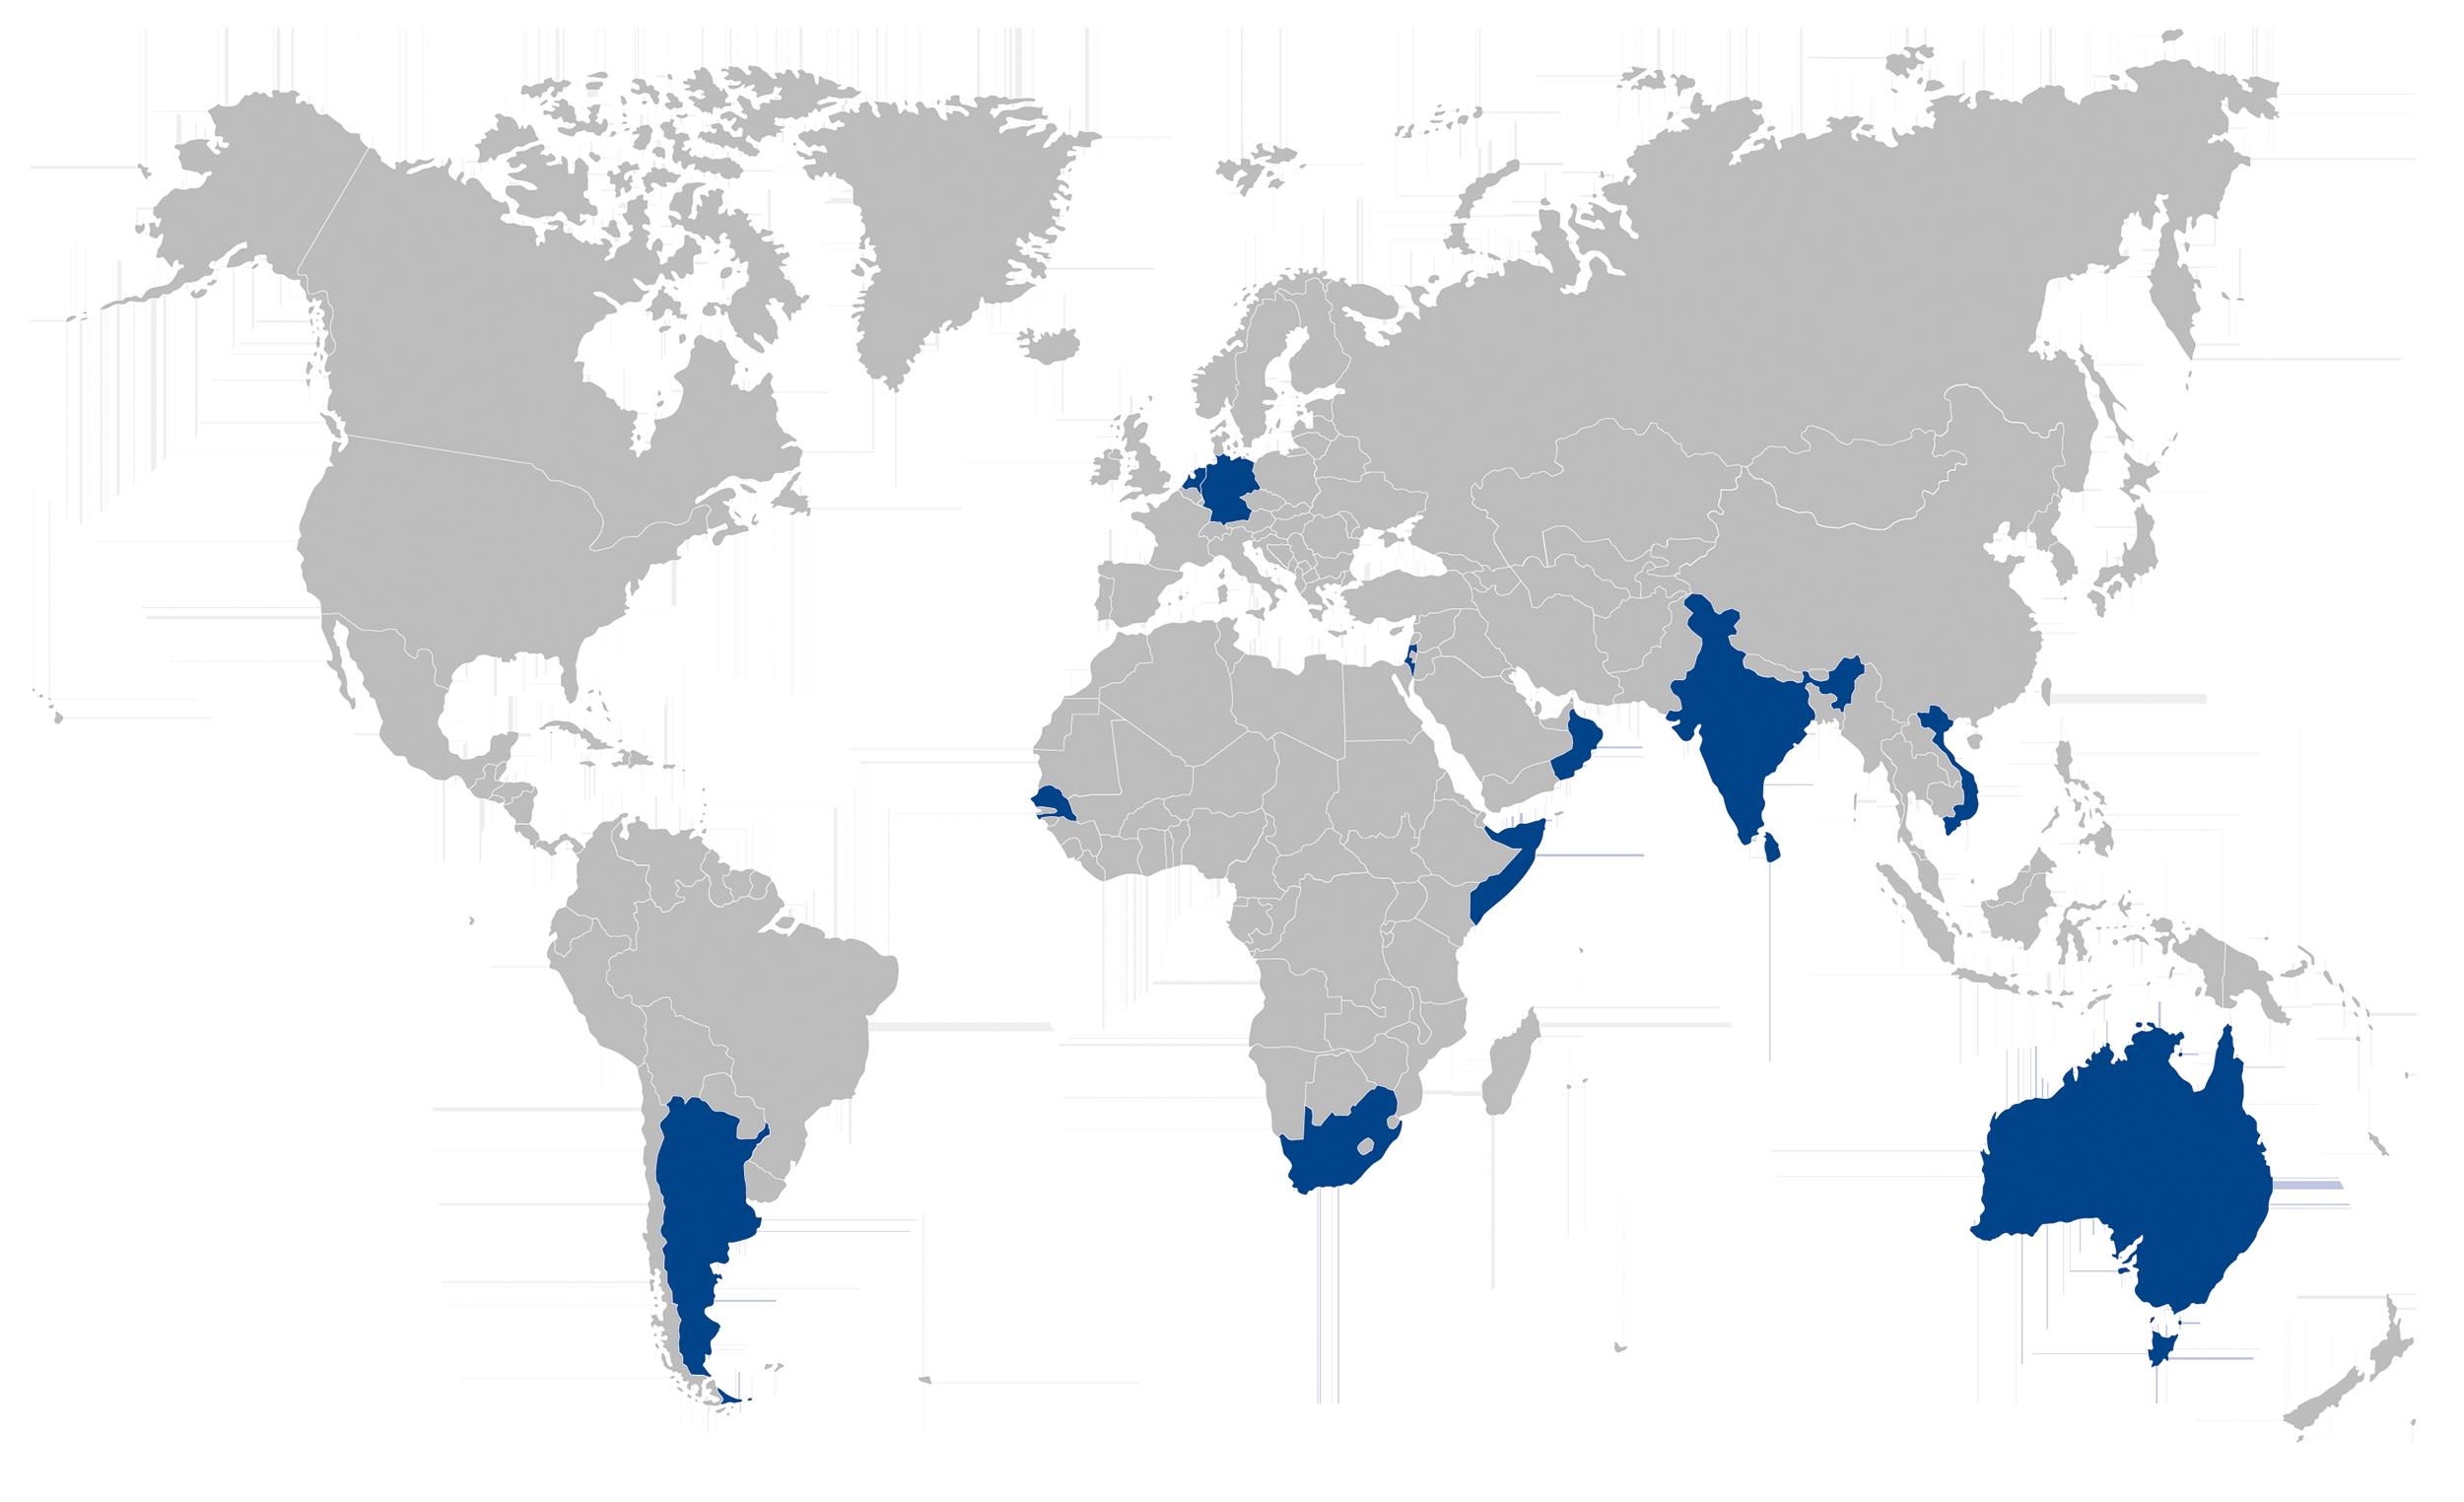 Solar power plants worldwide